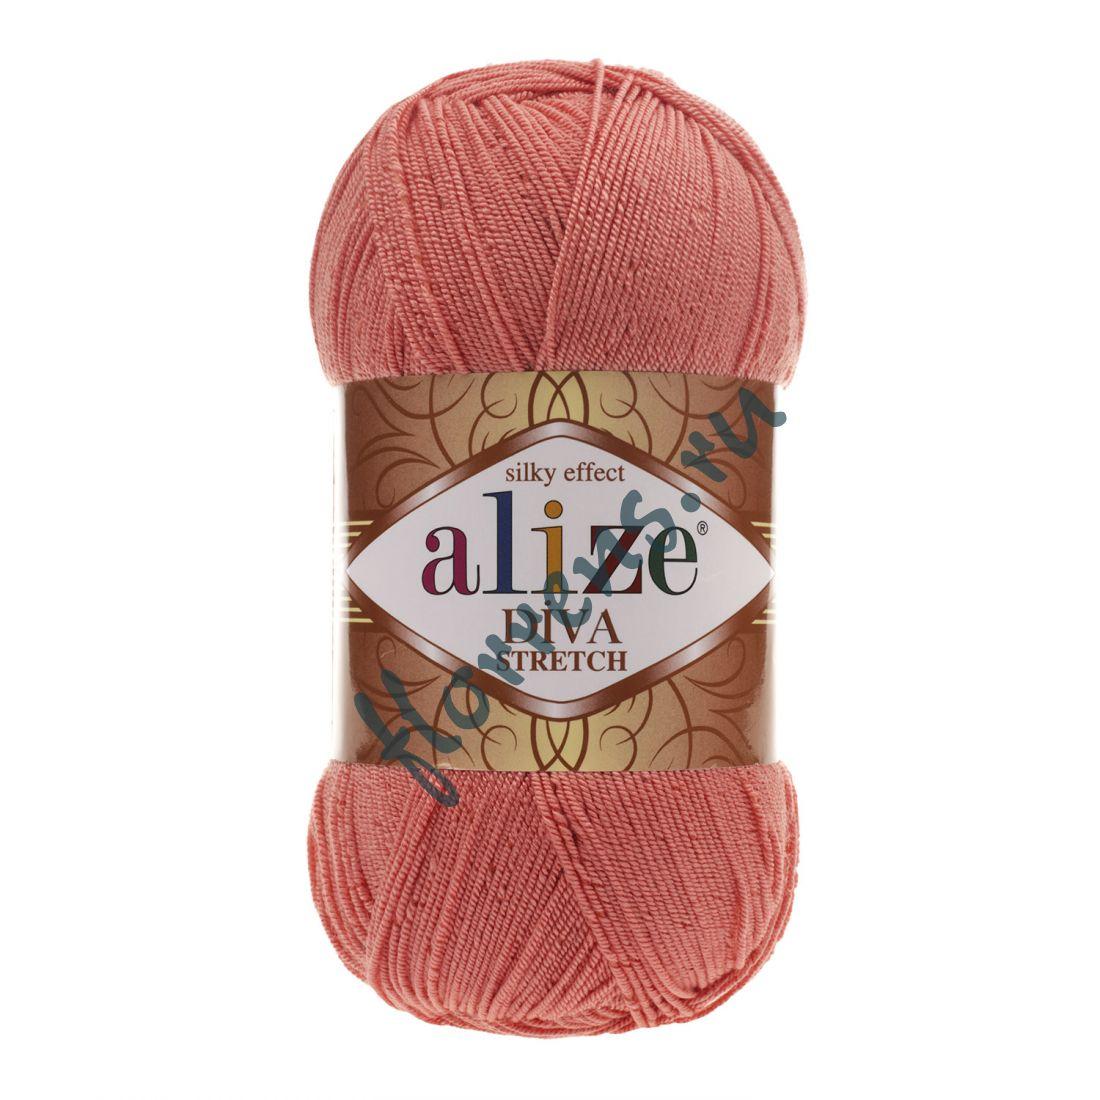 Пряжа Alize Diva Stretch / 619 коралловый